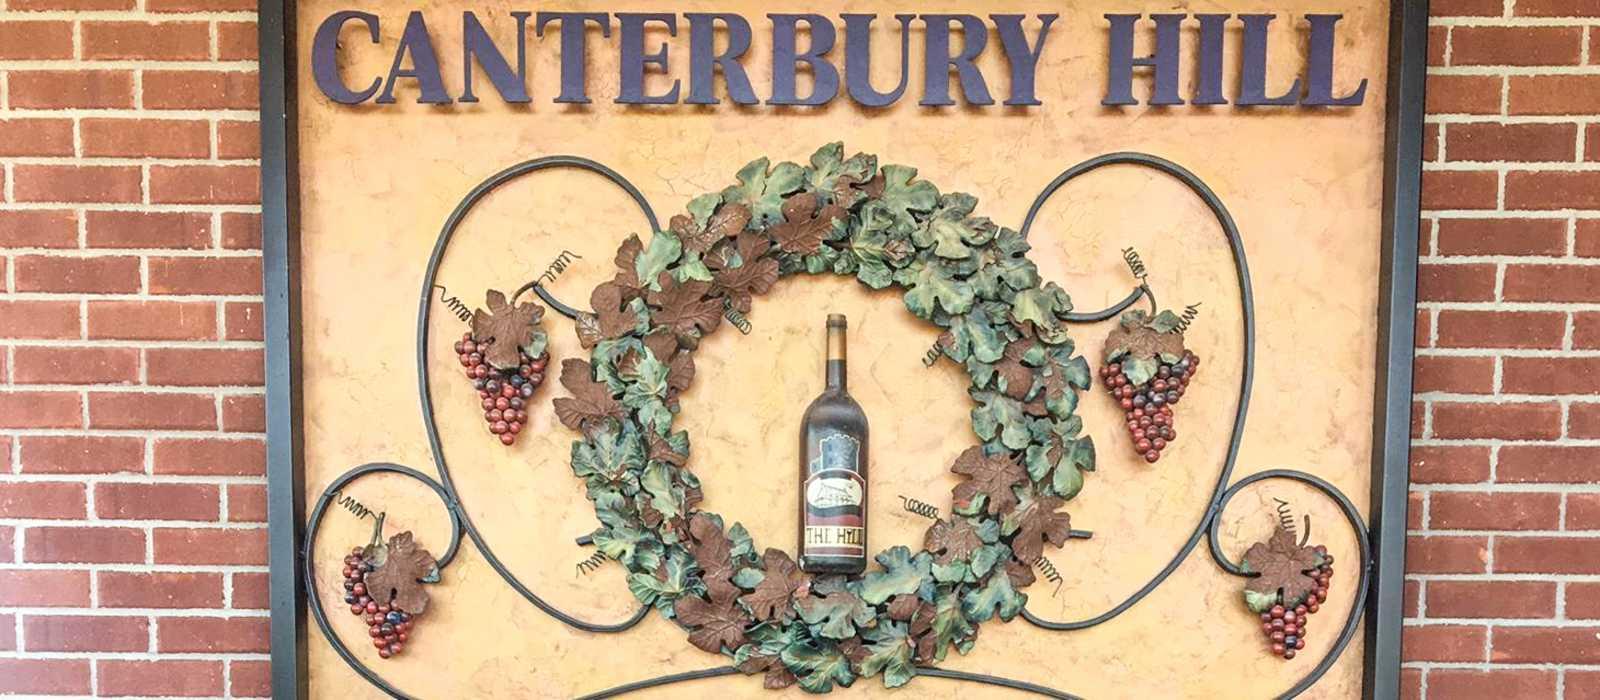 Canterbury Hill Winery